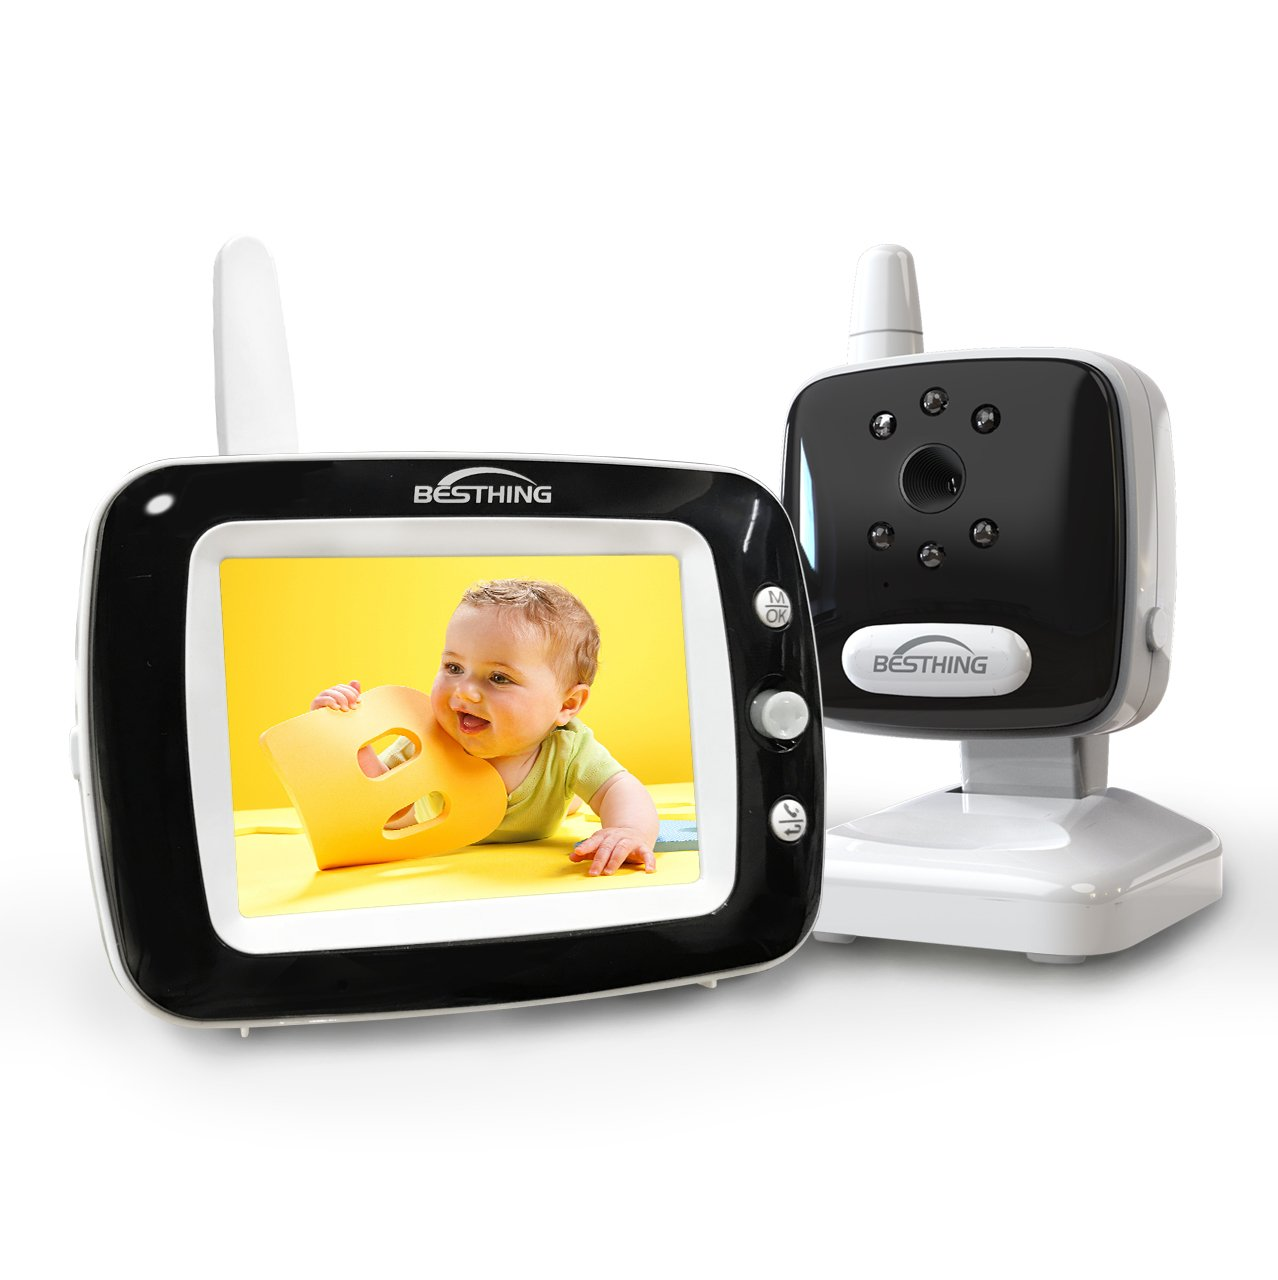 Aurola Baby Monitor with 3.5'' LCD Screen, Digital Camera, Infrared Night Vision, Two-Way Talk Back, Lullabies, Long Range, Temperature Monitoring, and High Capacity Battery, Black